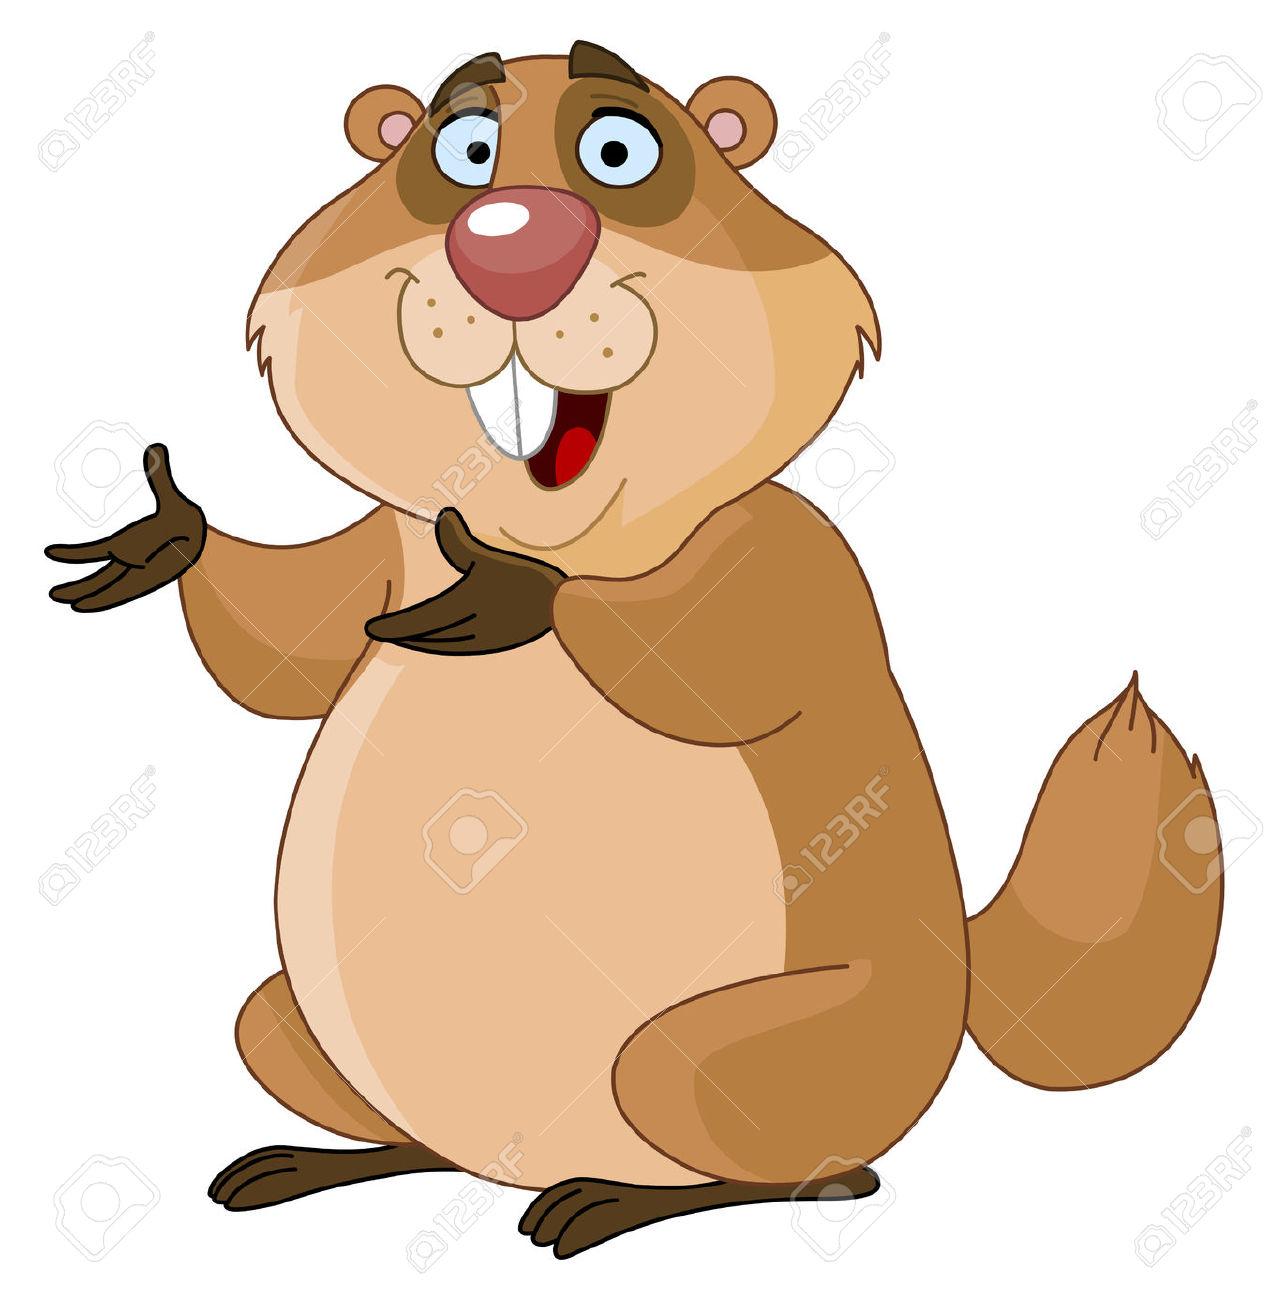 Woodchuck clipart image picture transparent woodchuck: Groundhog   Clipart Panda - Free Clipart Images picture transparent